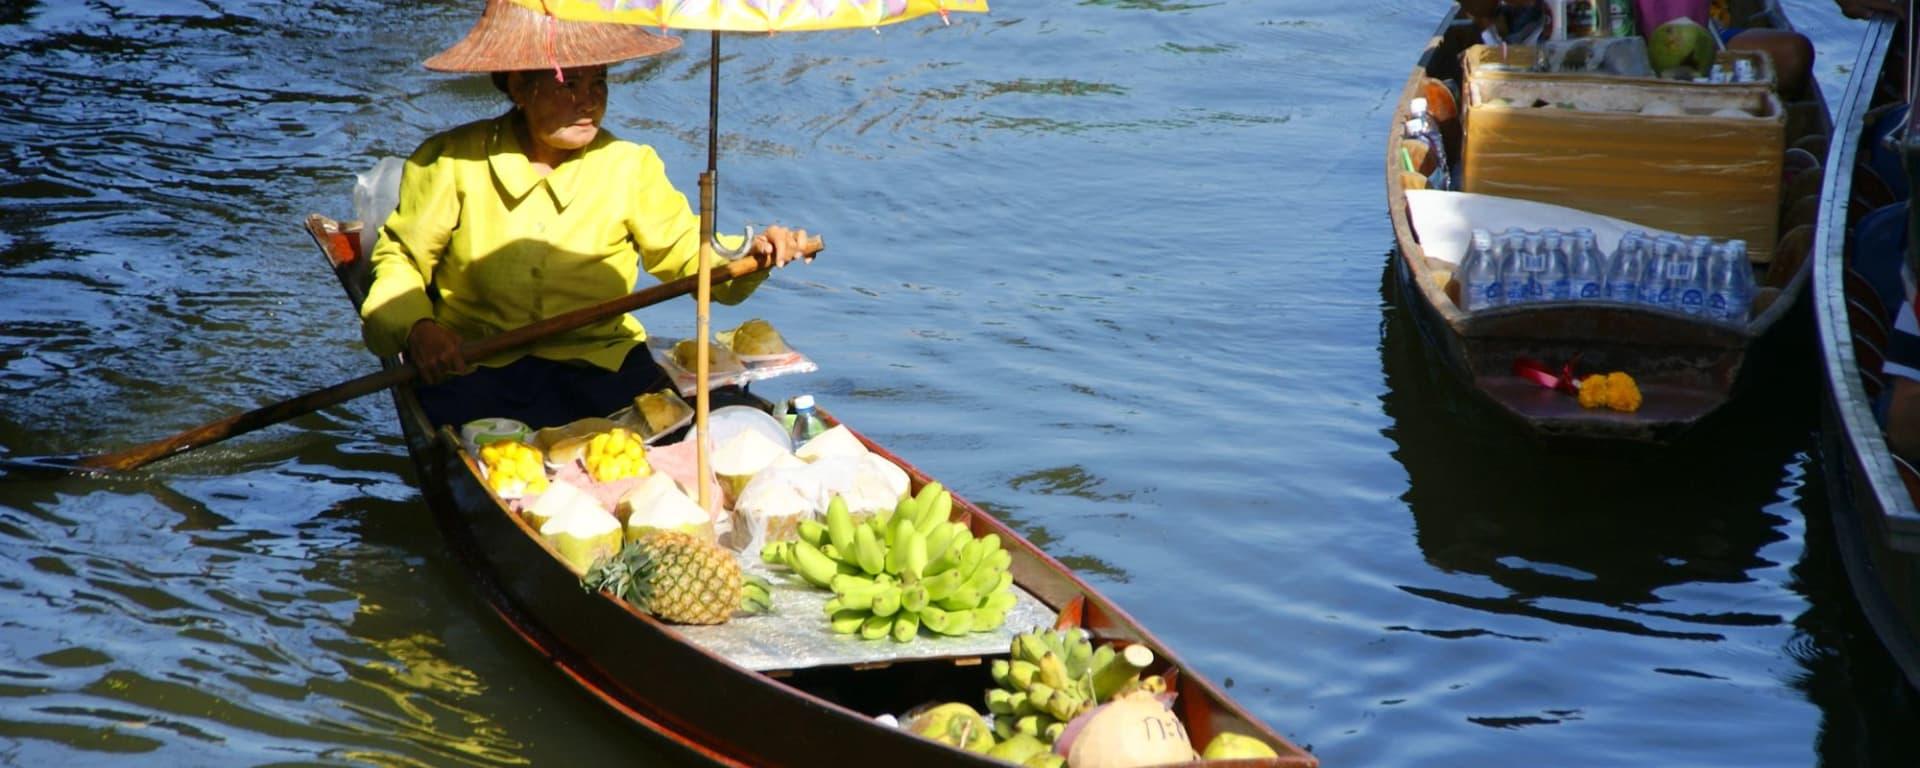 «Railway Market», marché flottant & vie villageoise à Bangkok: Damnoen Saduak Floating Market